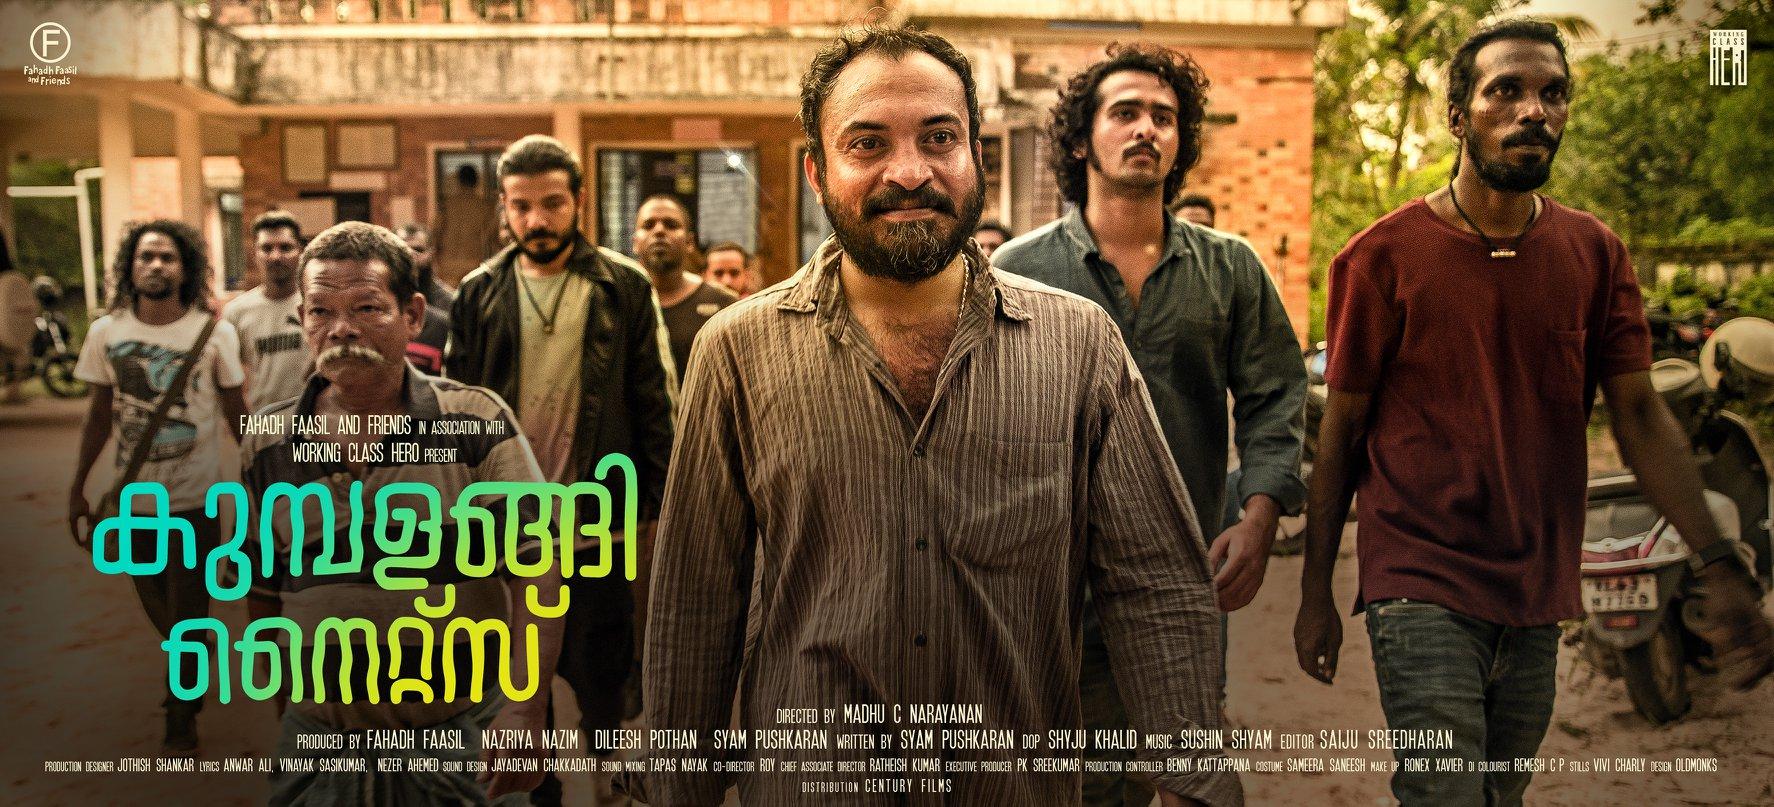 kumbalangi nights movie stills 09923 6